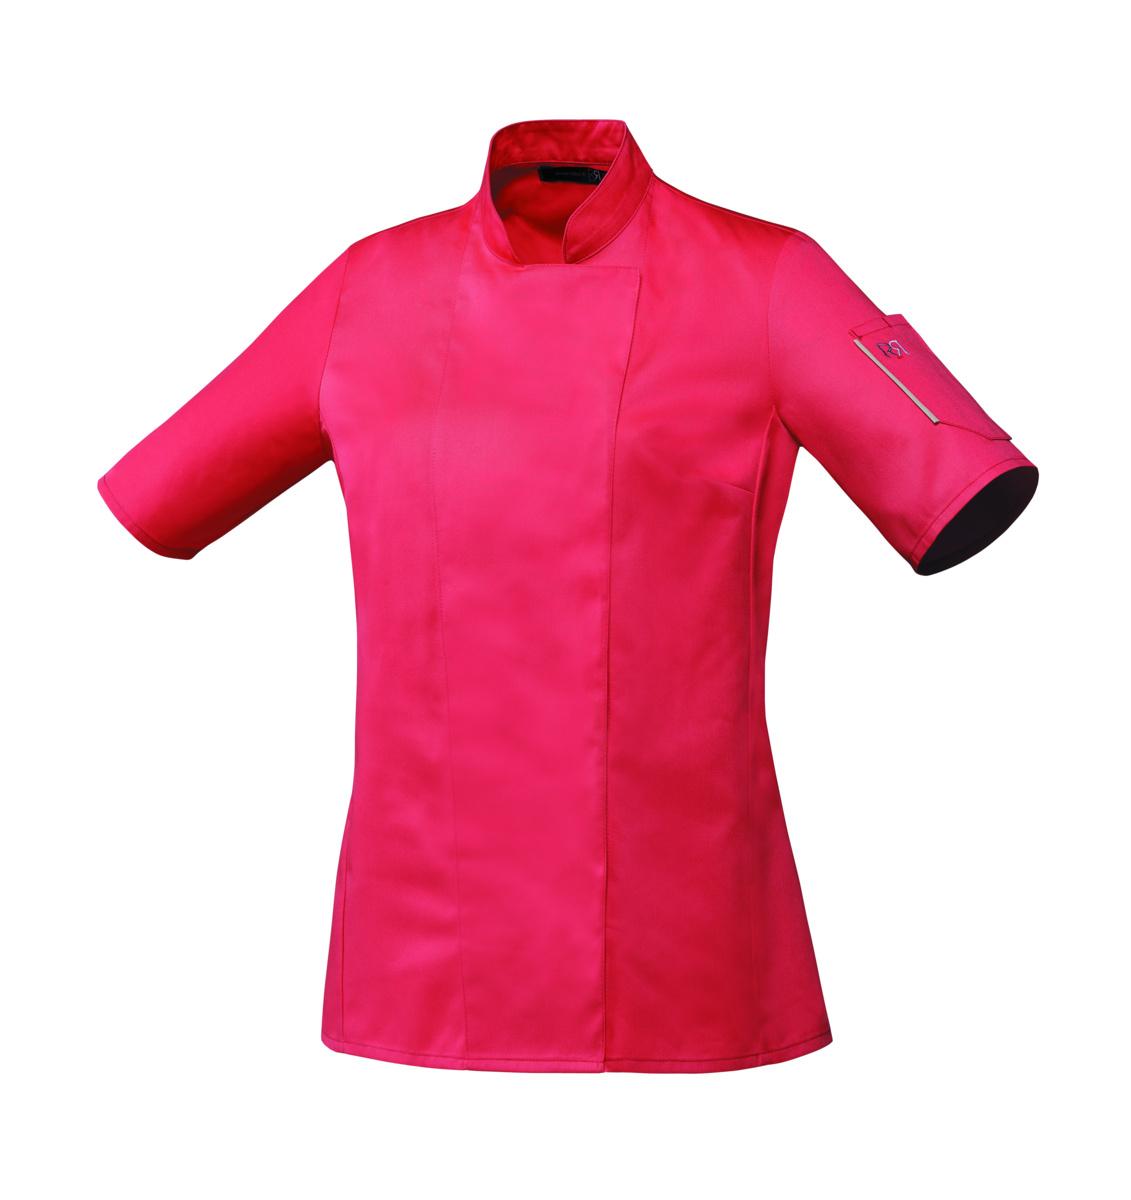 Veste femme rose taille 1 Unera Robur